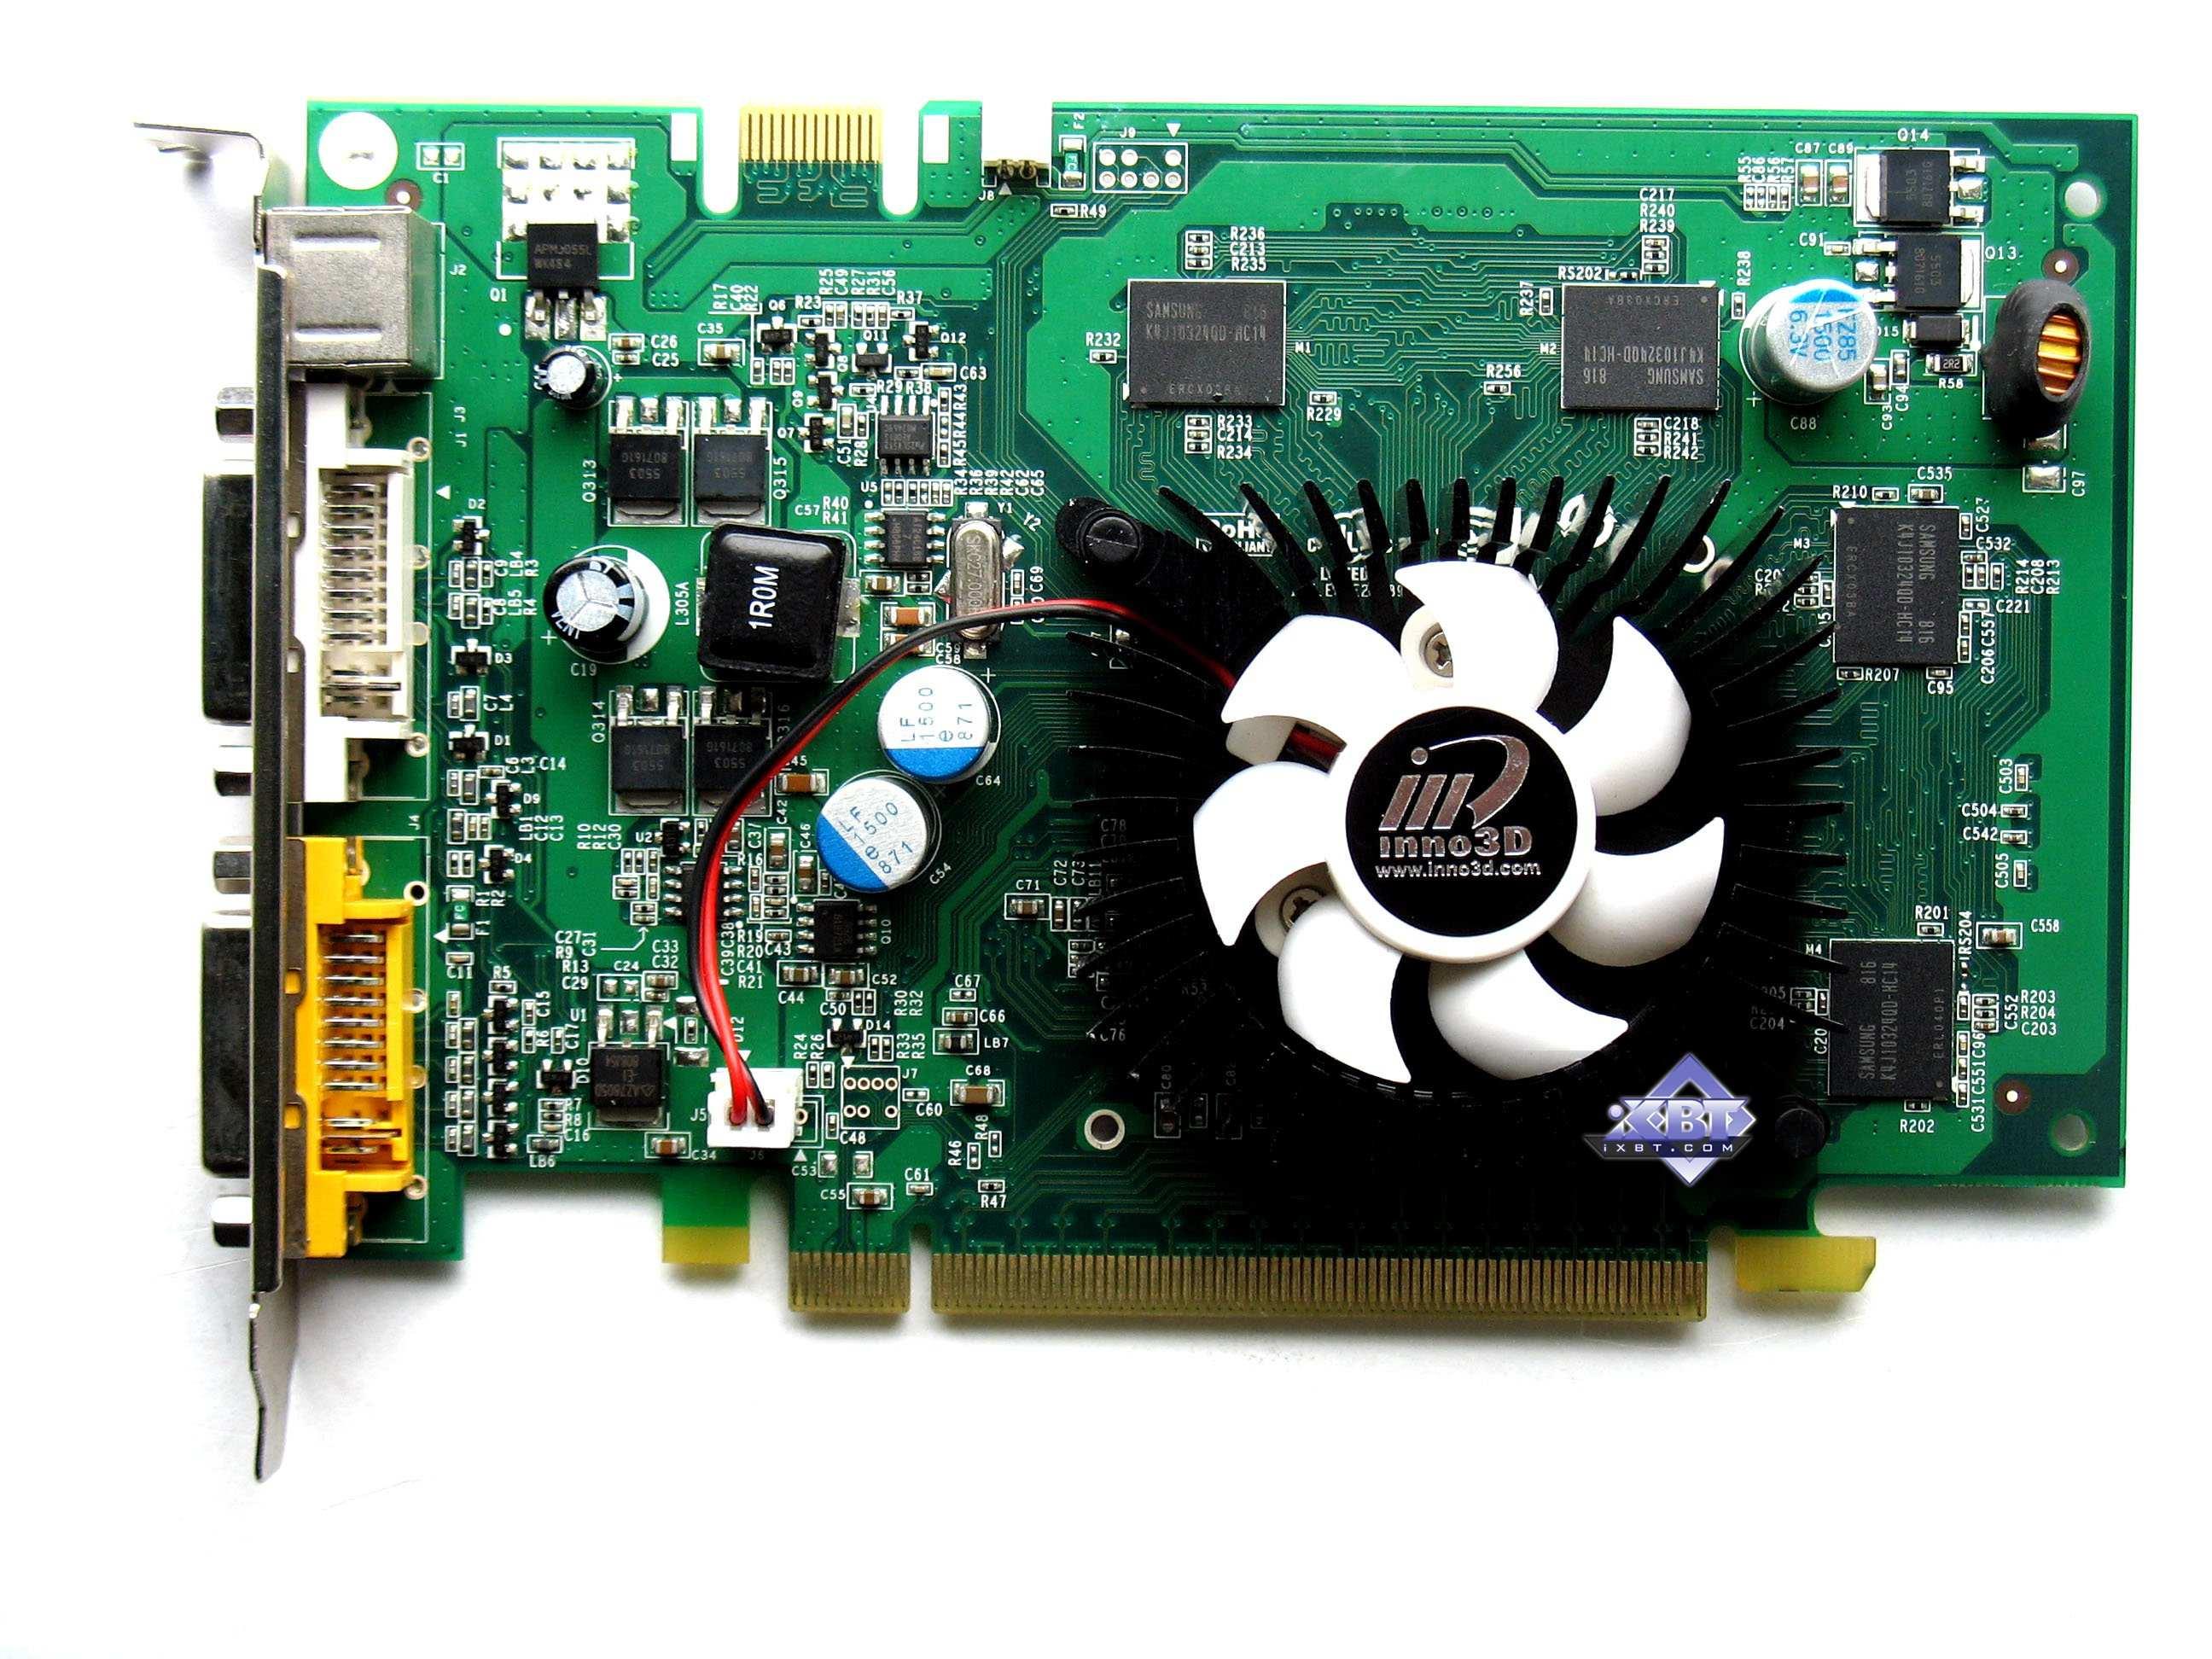 GeForce 95 GT | Specifications | GeForce